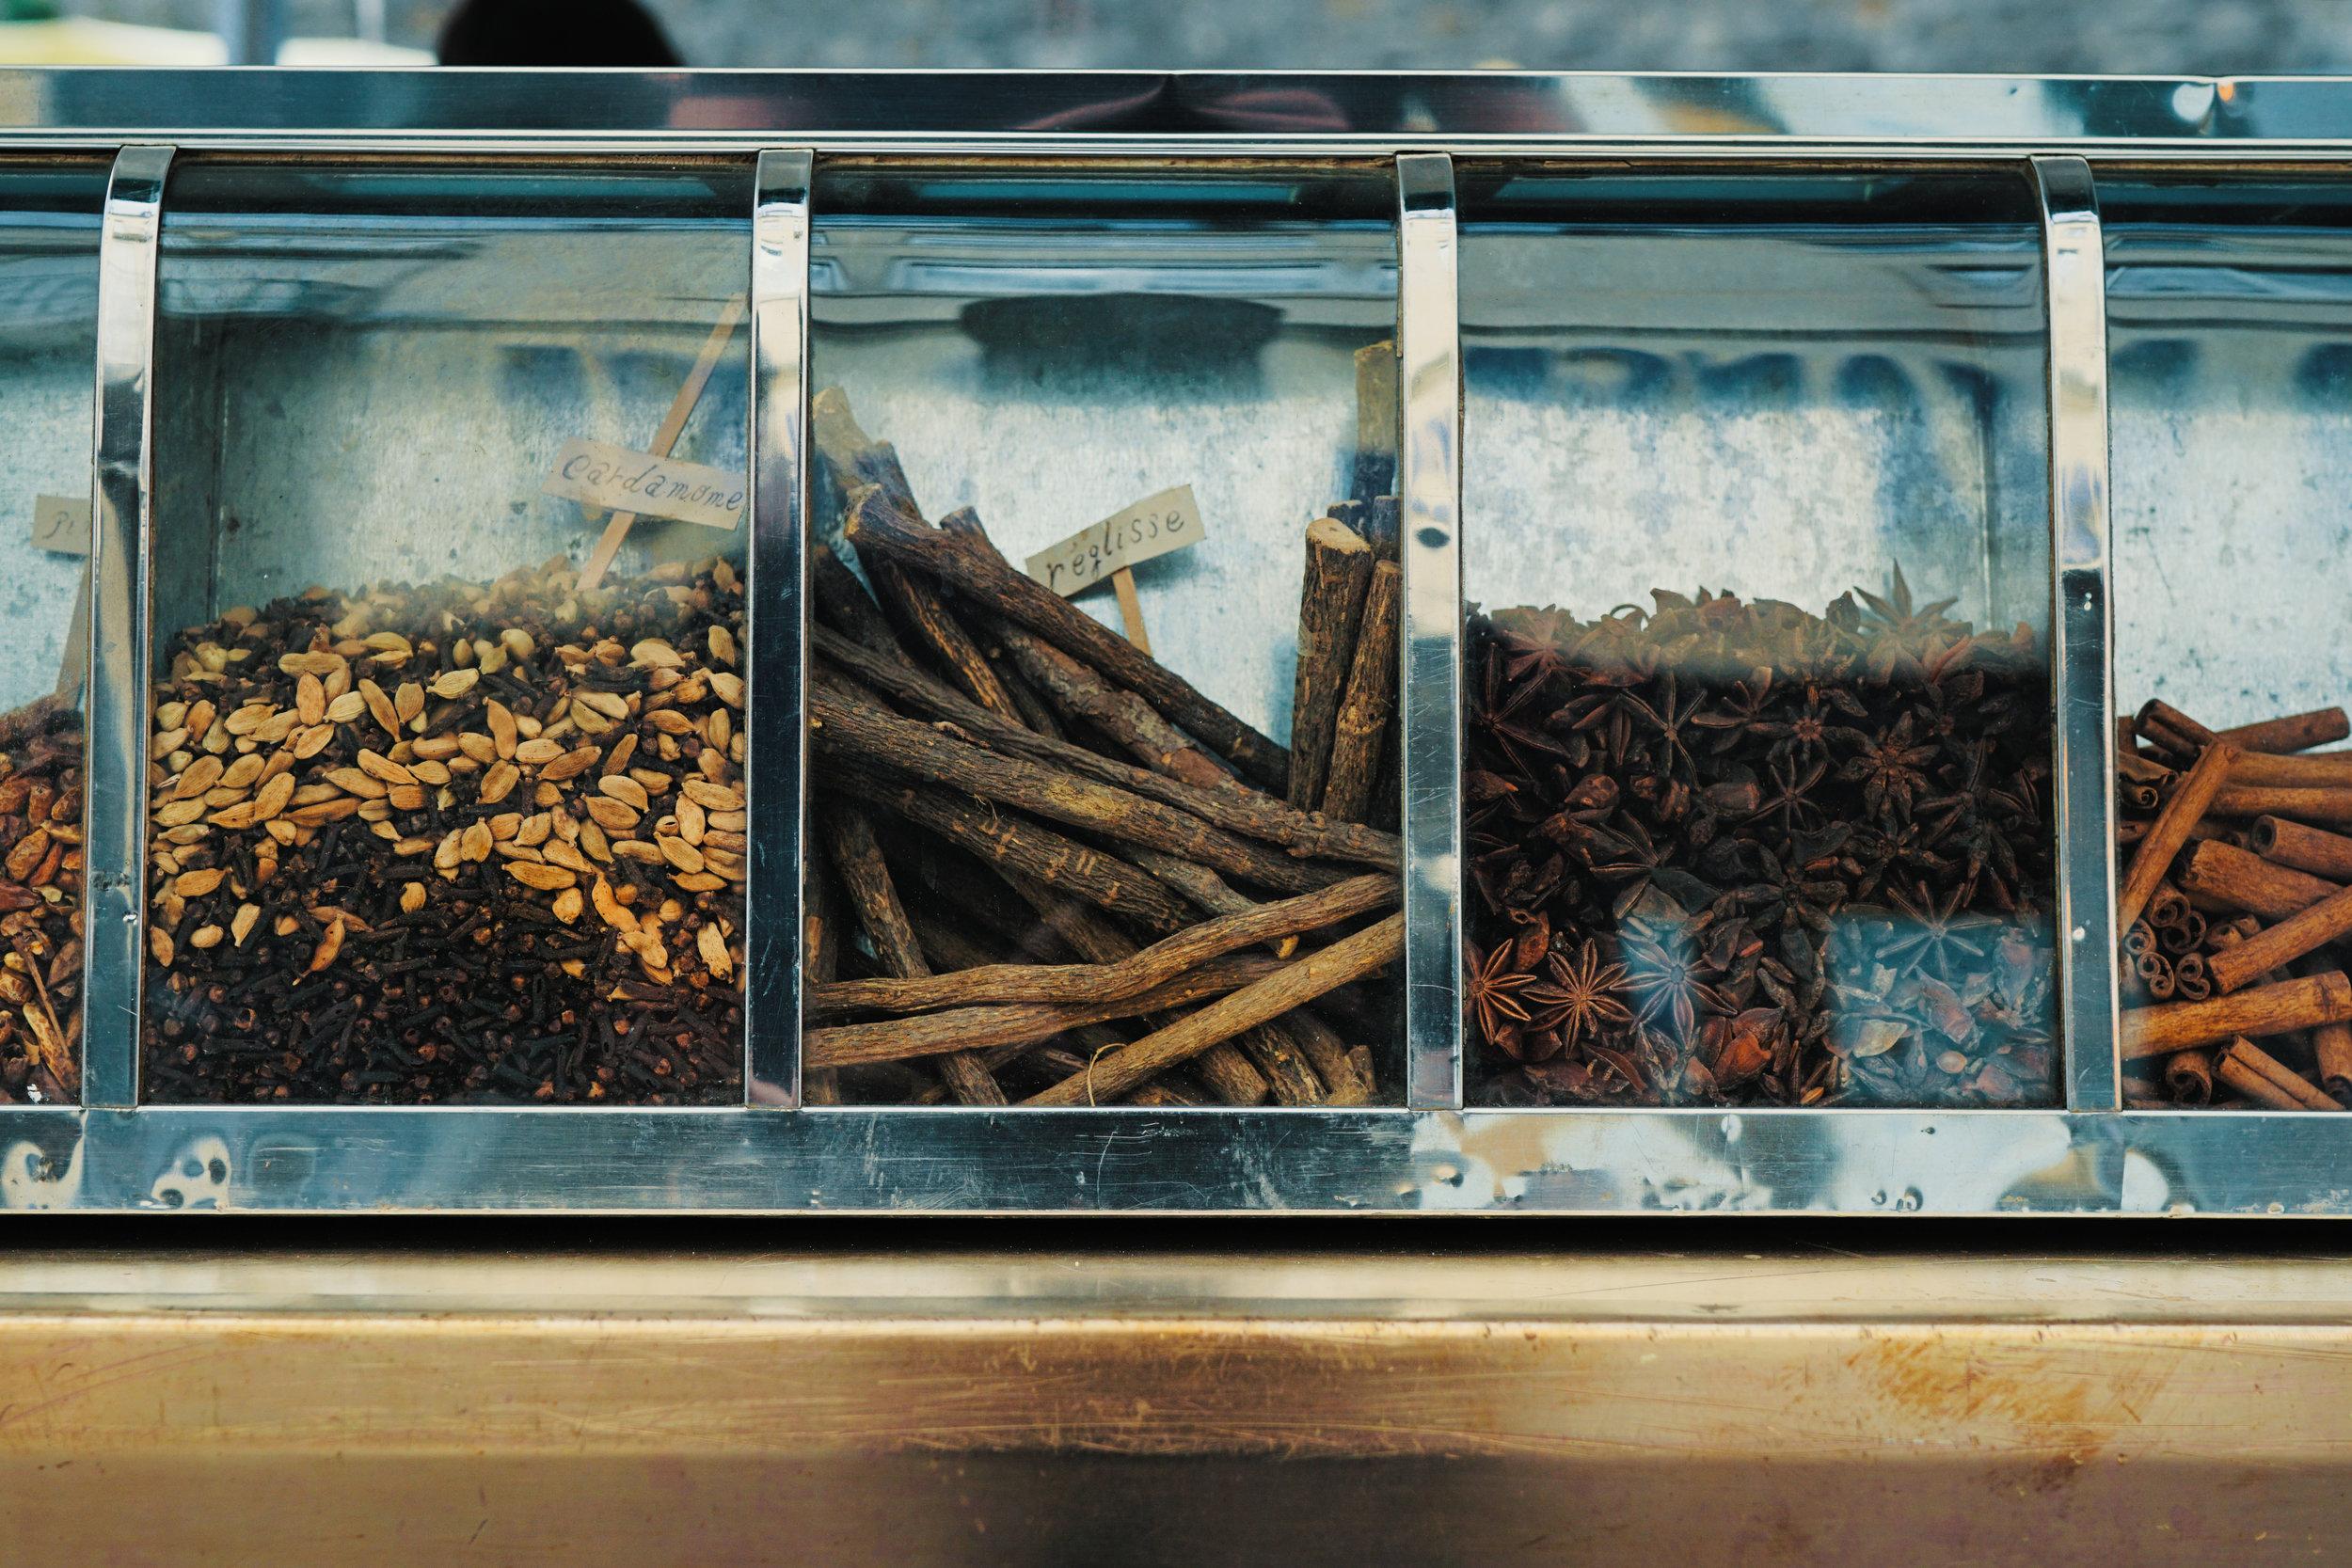 spices - Cinnamon – Cinnamon increases blood flowCloves – has Anti inflammatory propertiesNutmeg – works Anti-bacterialBlack Pepper – is good for the Stomach & Skin Health